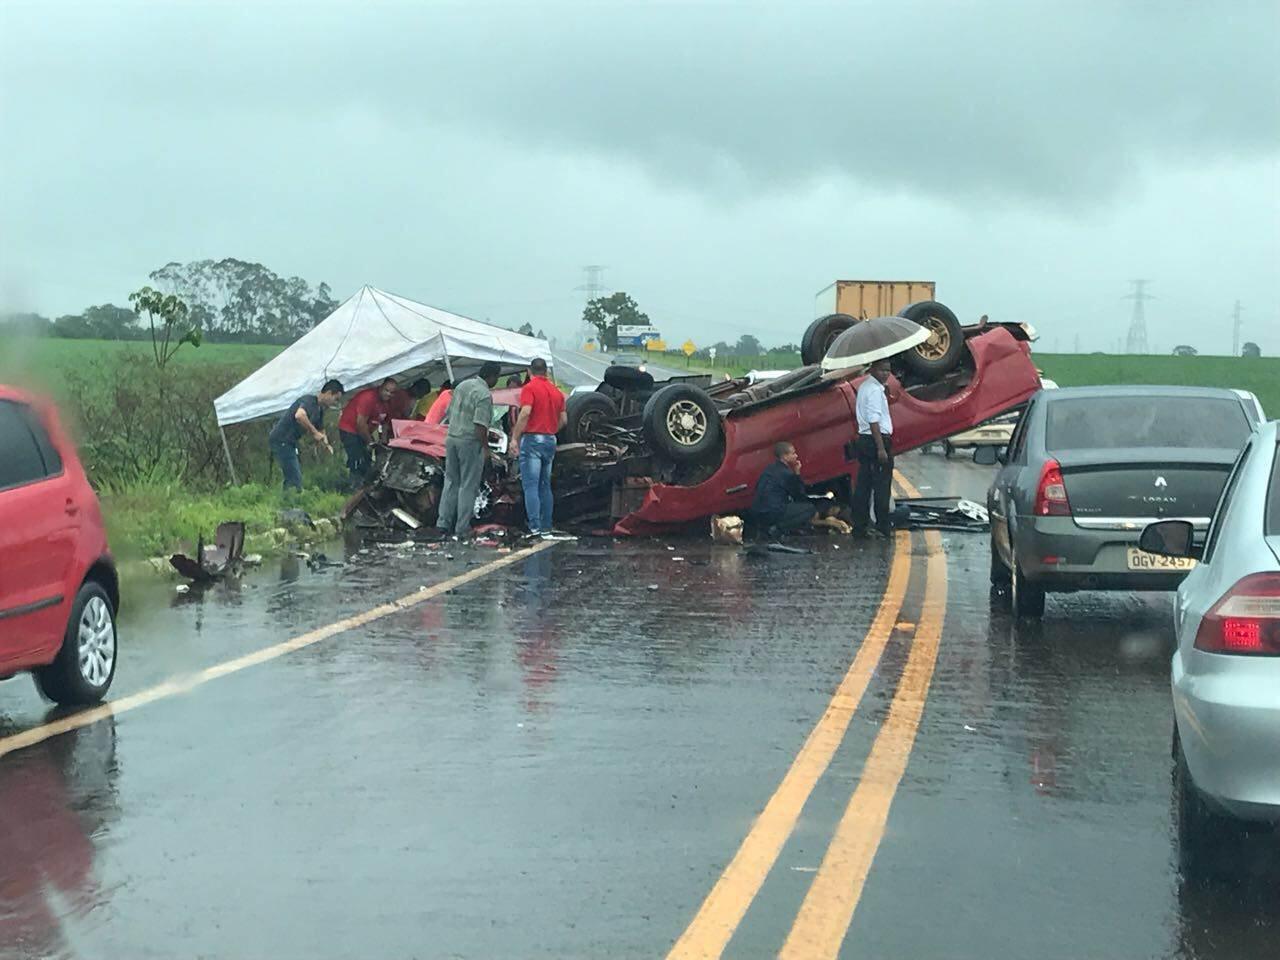 Acidente grave na GO-210, entre Santa Helena e Rio Verde | Foto: Leitor / WhatsApp